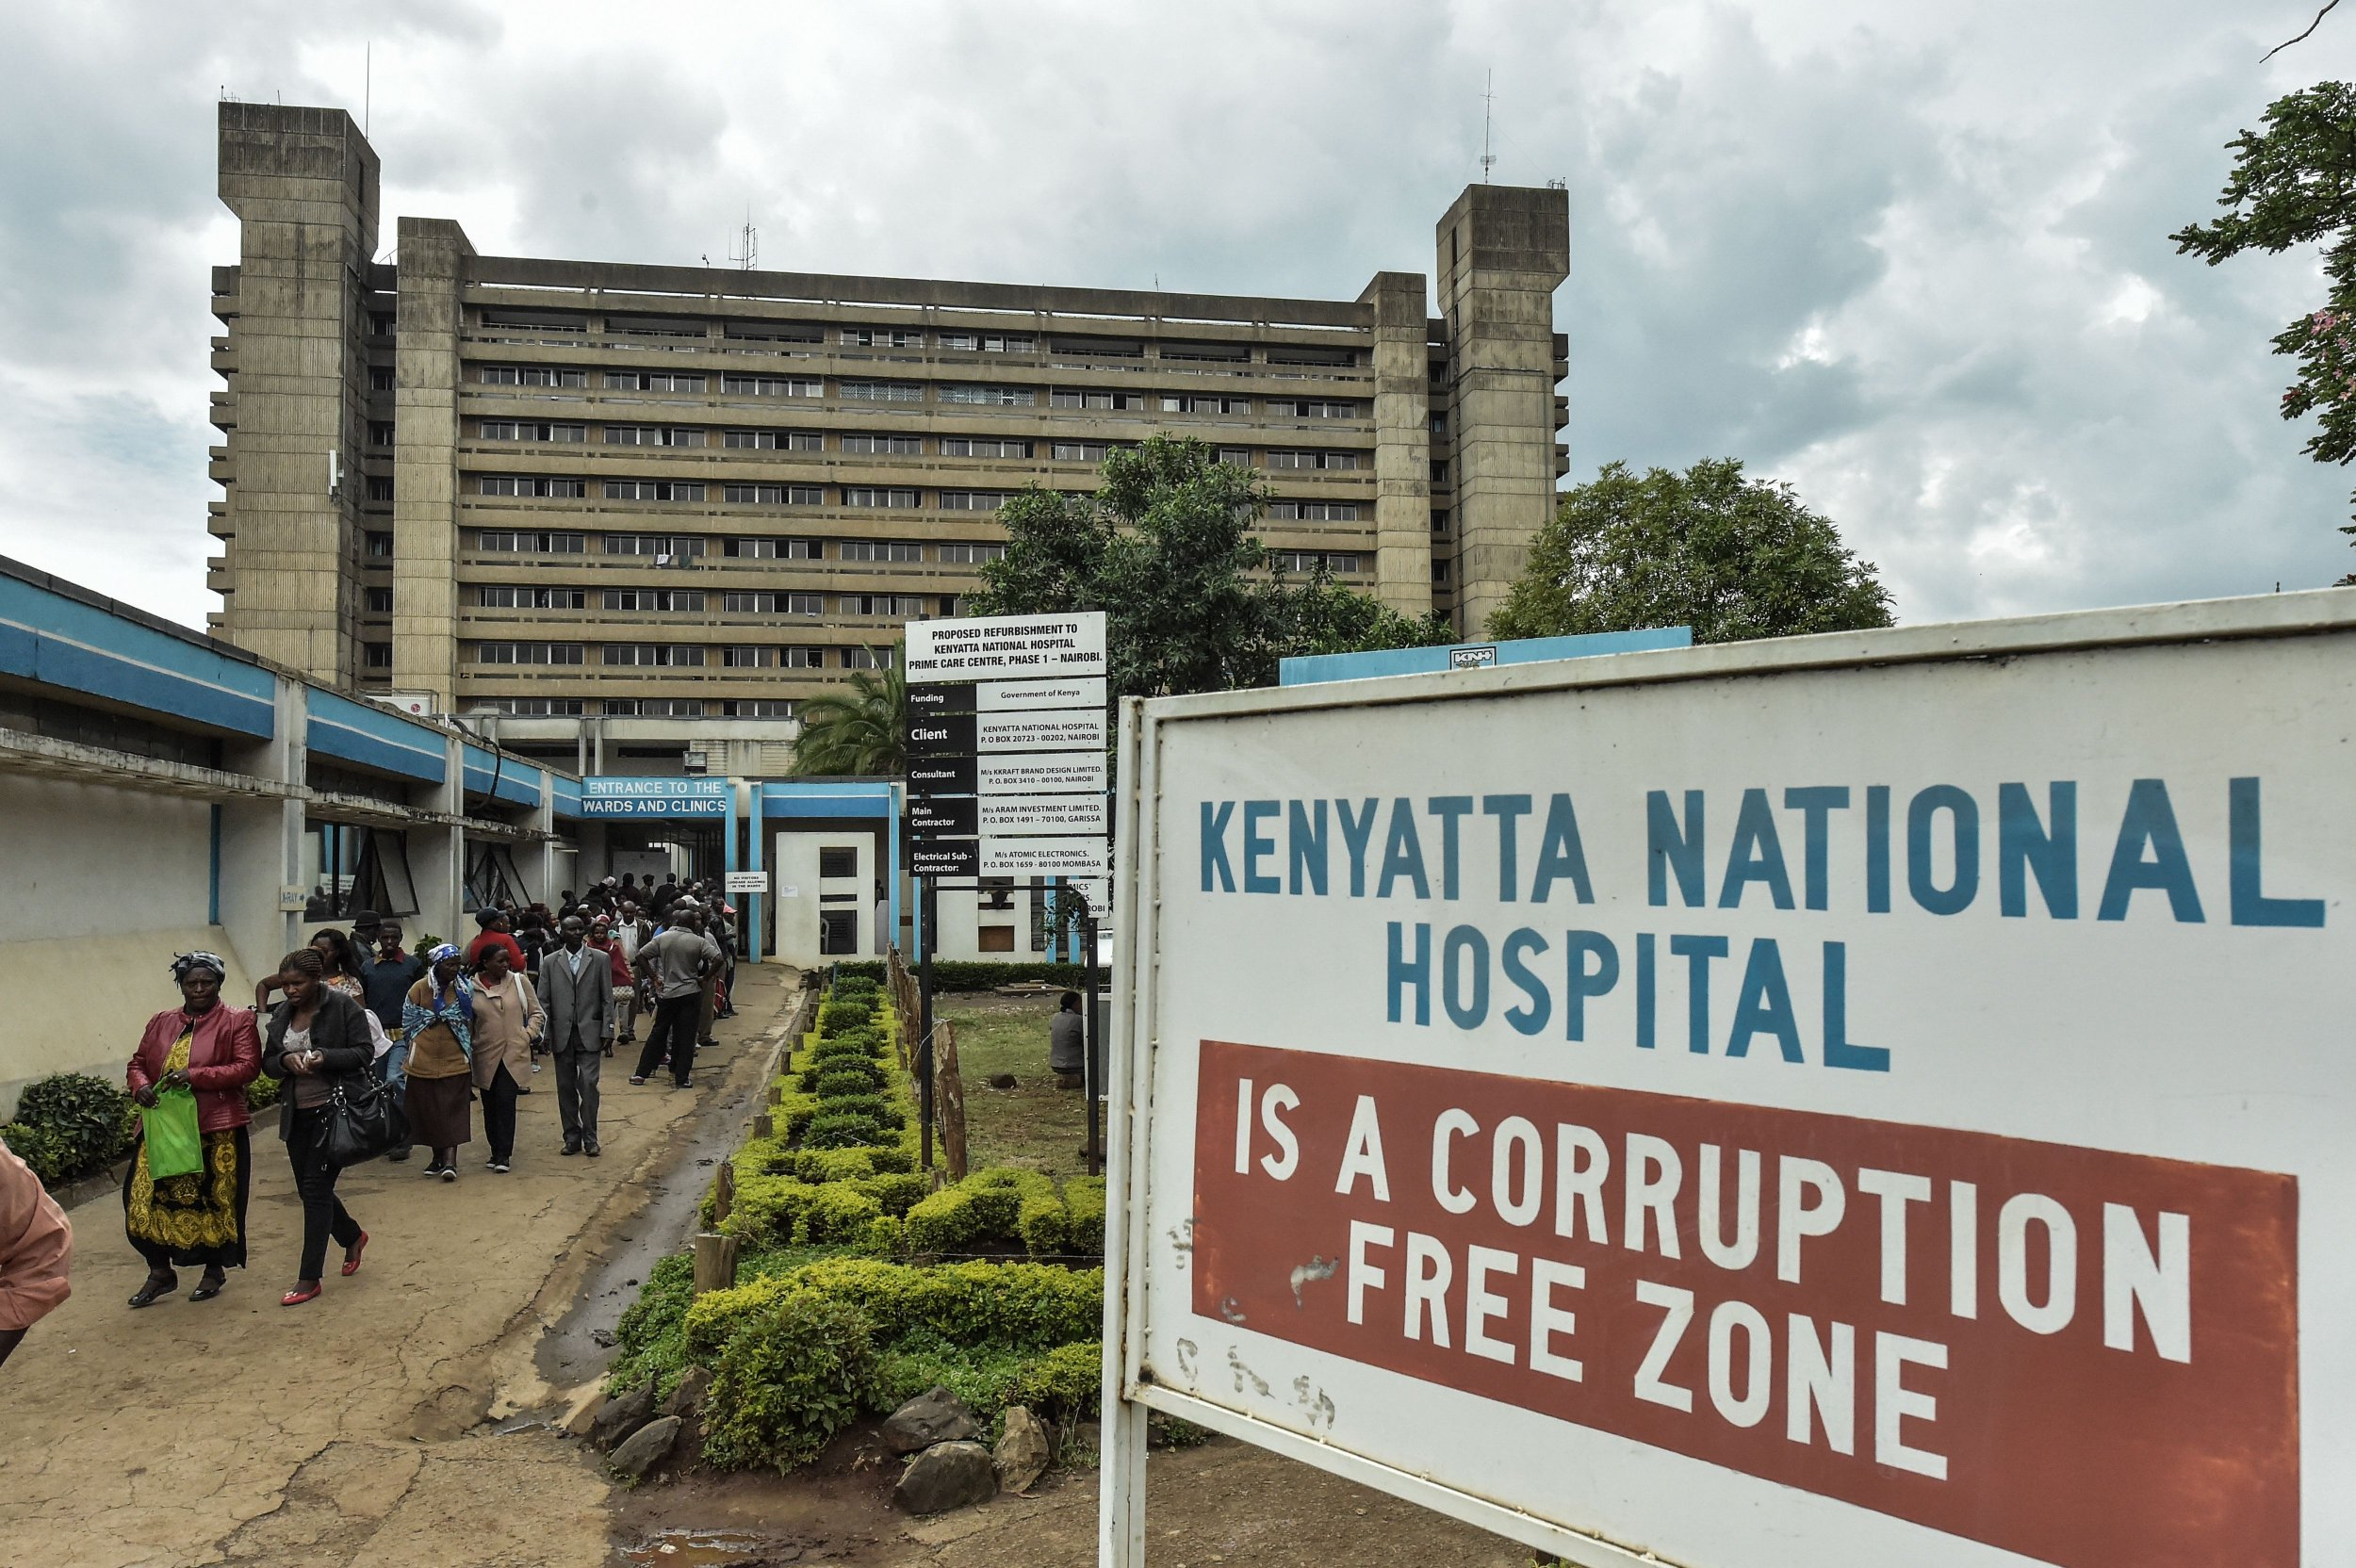 kenyatta-national-hospital